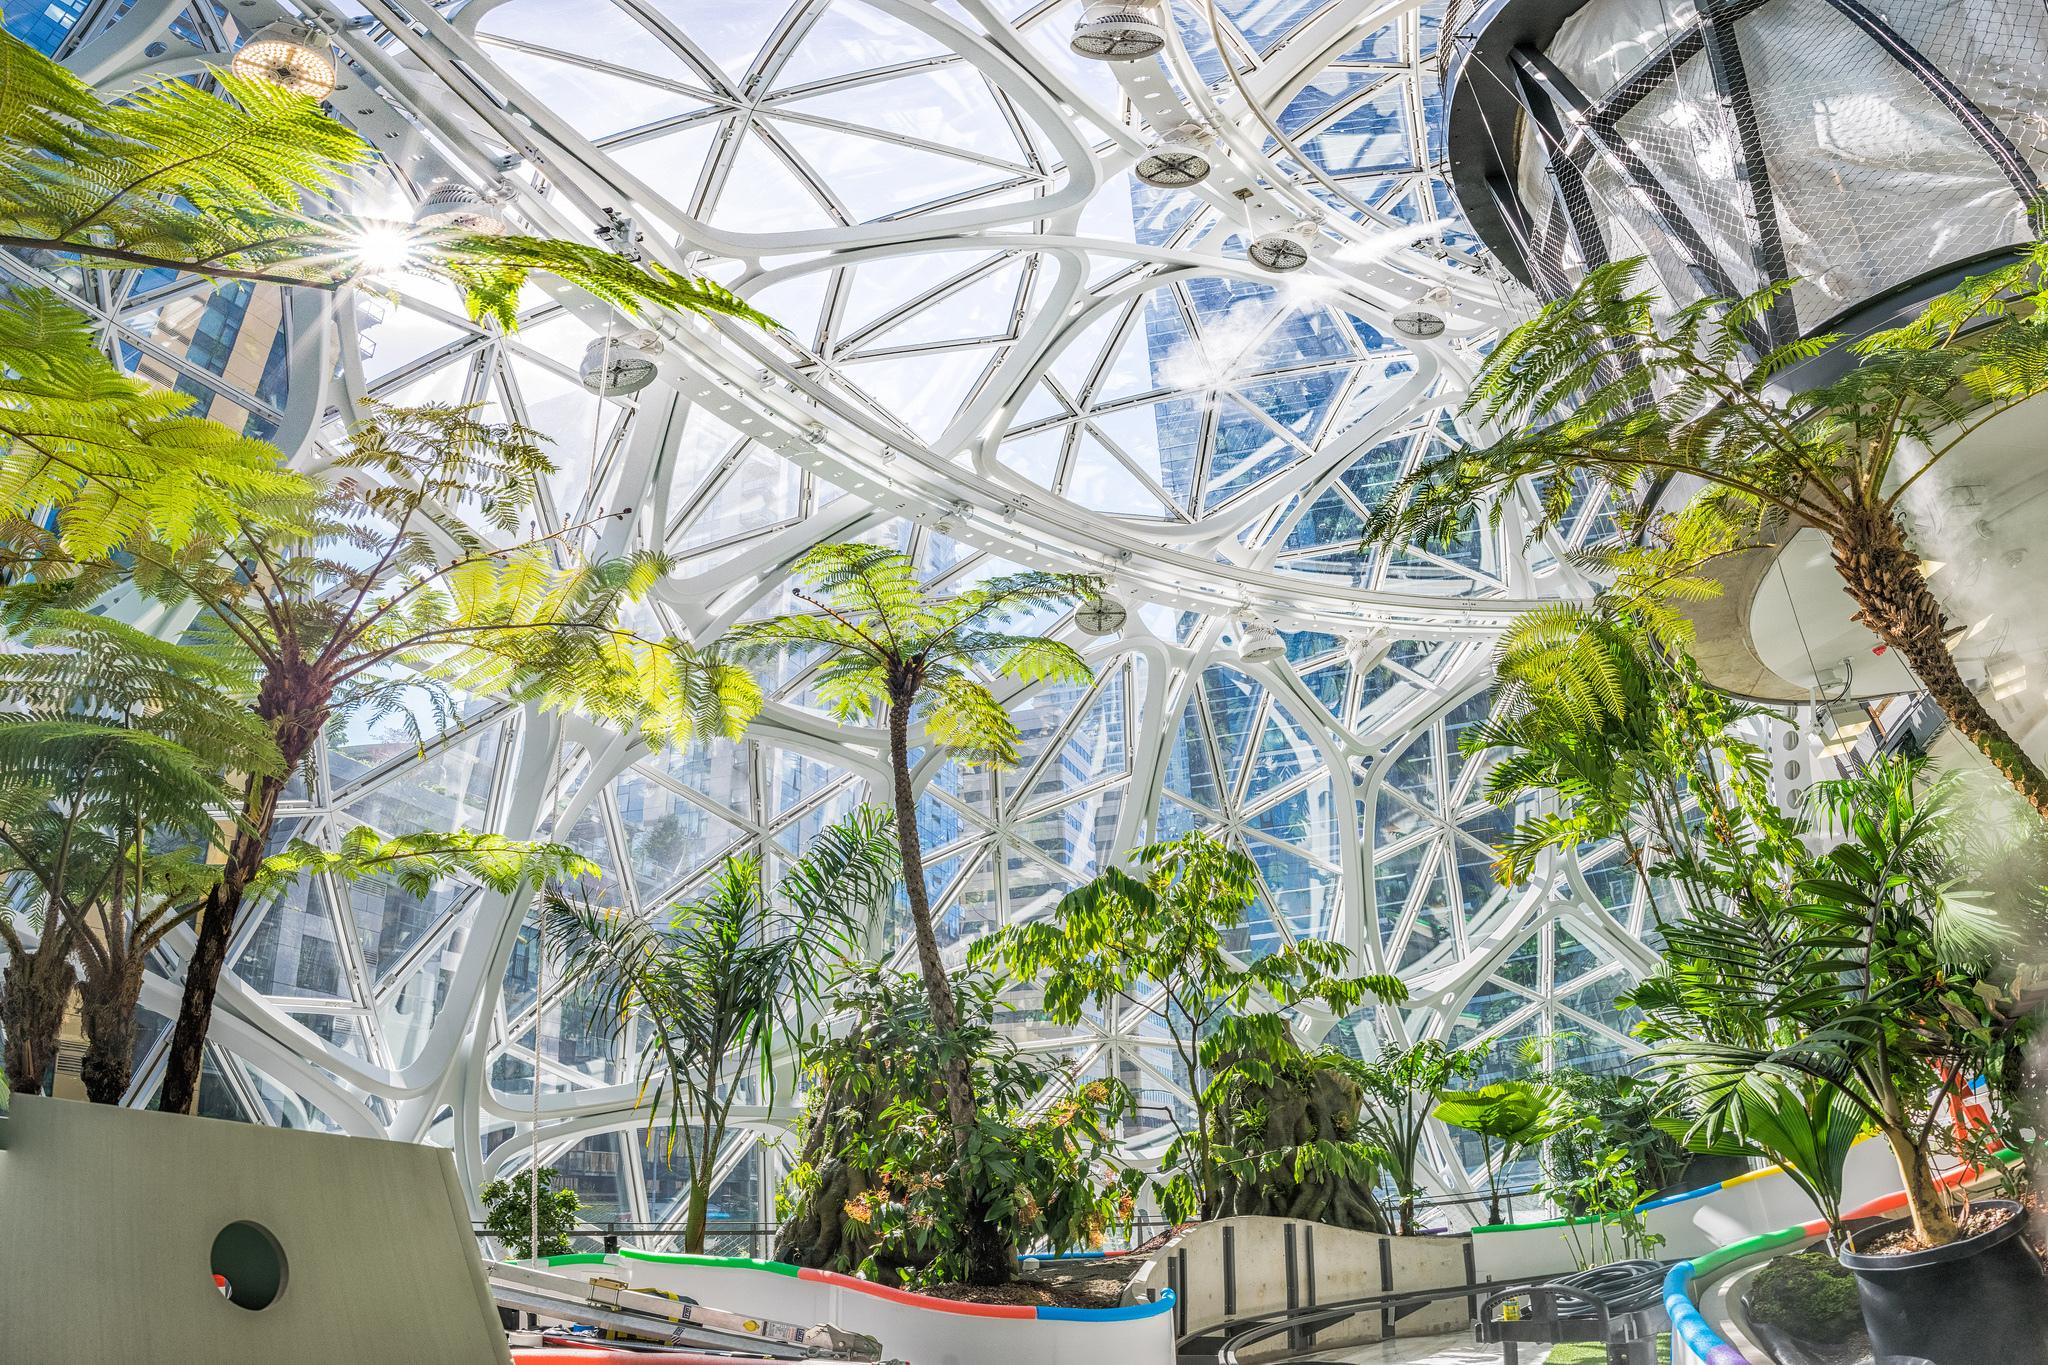 The Spheres at Amazon